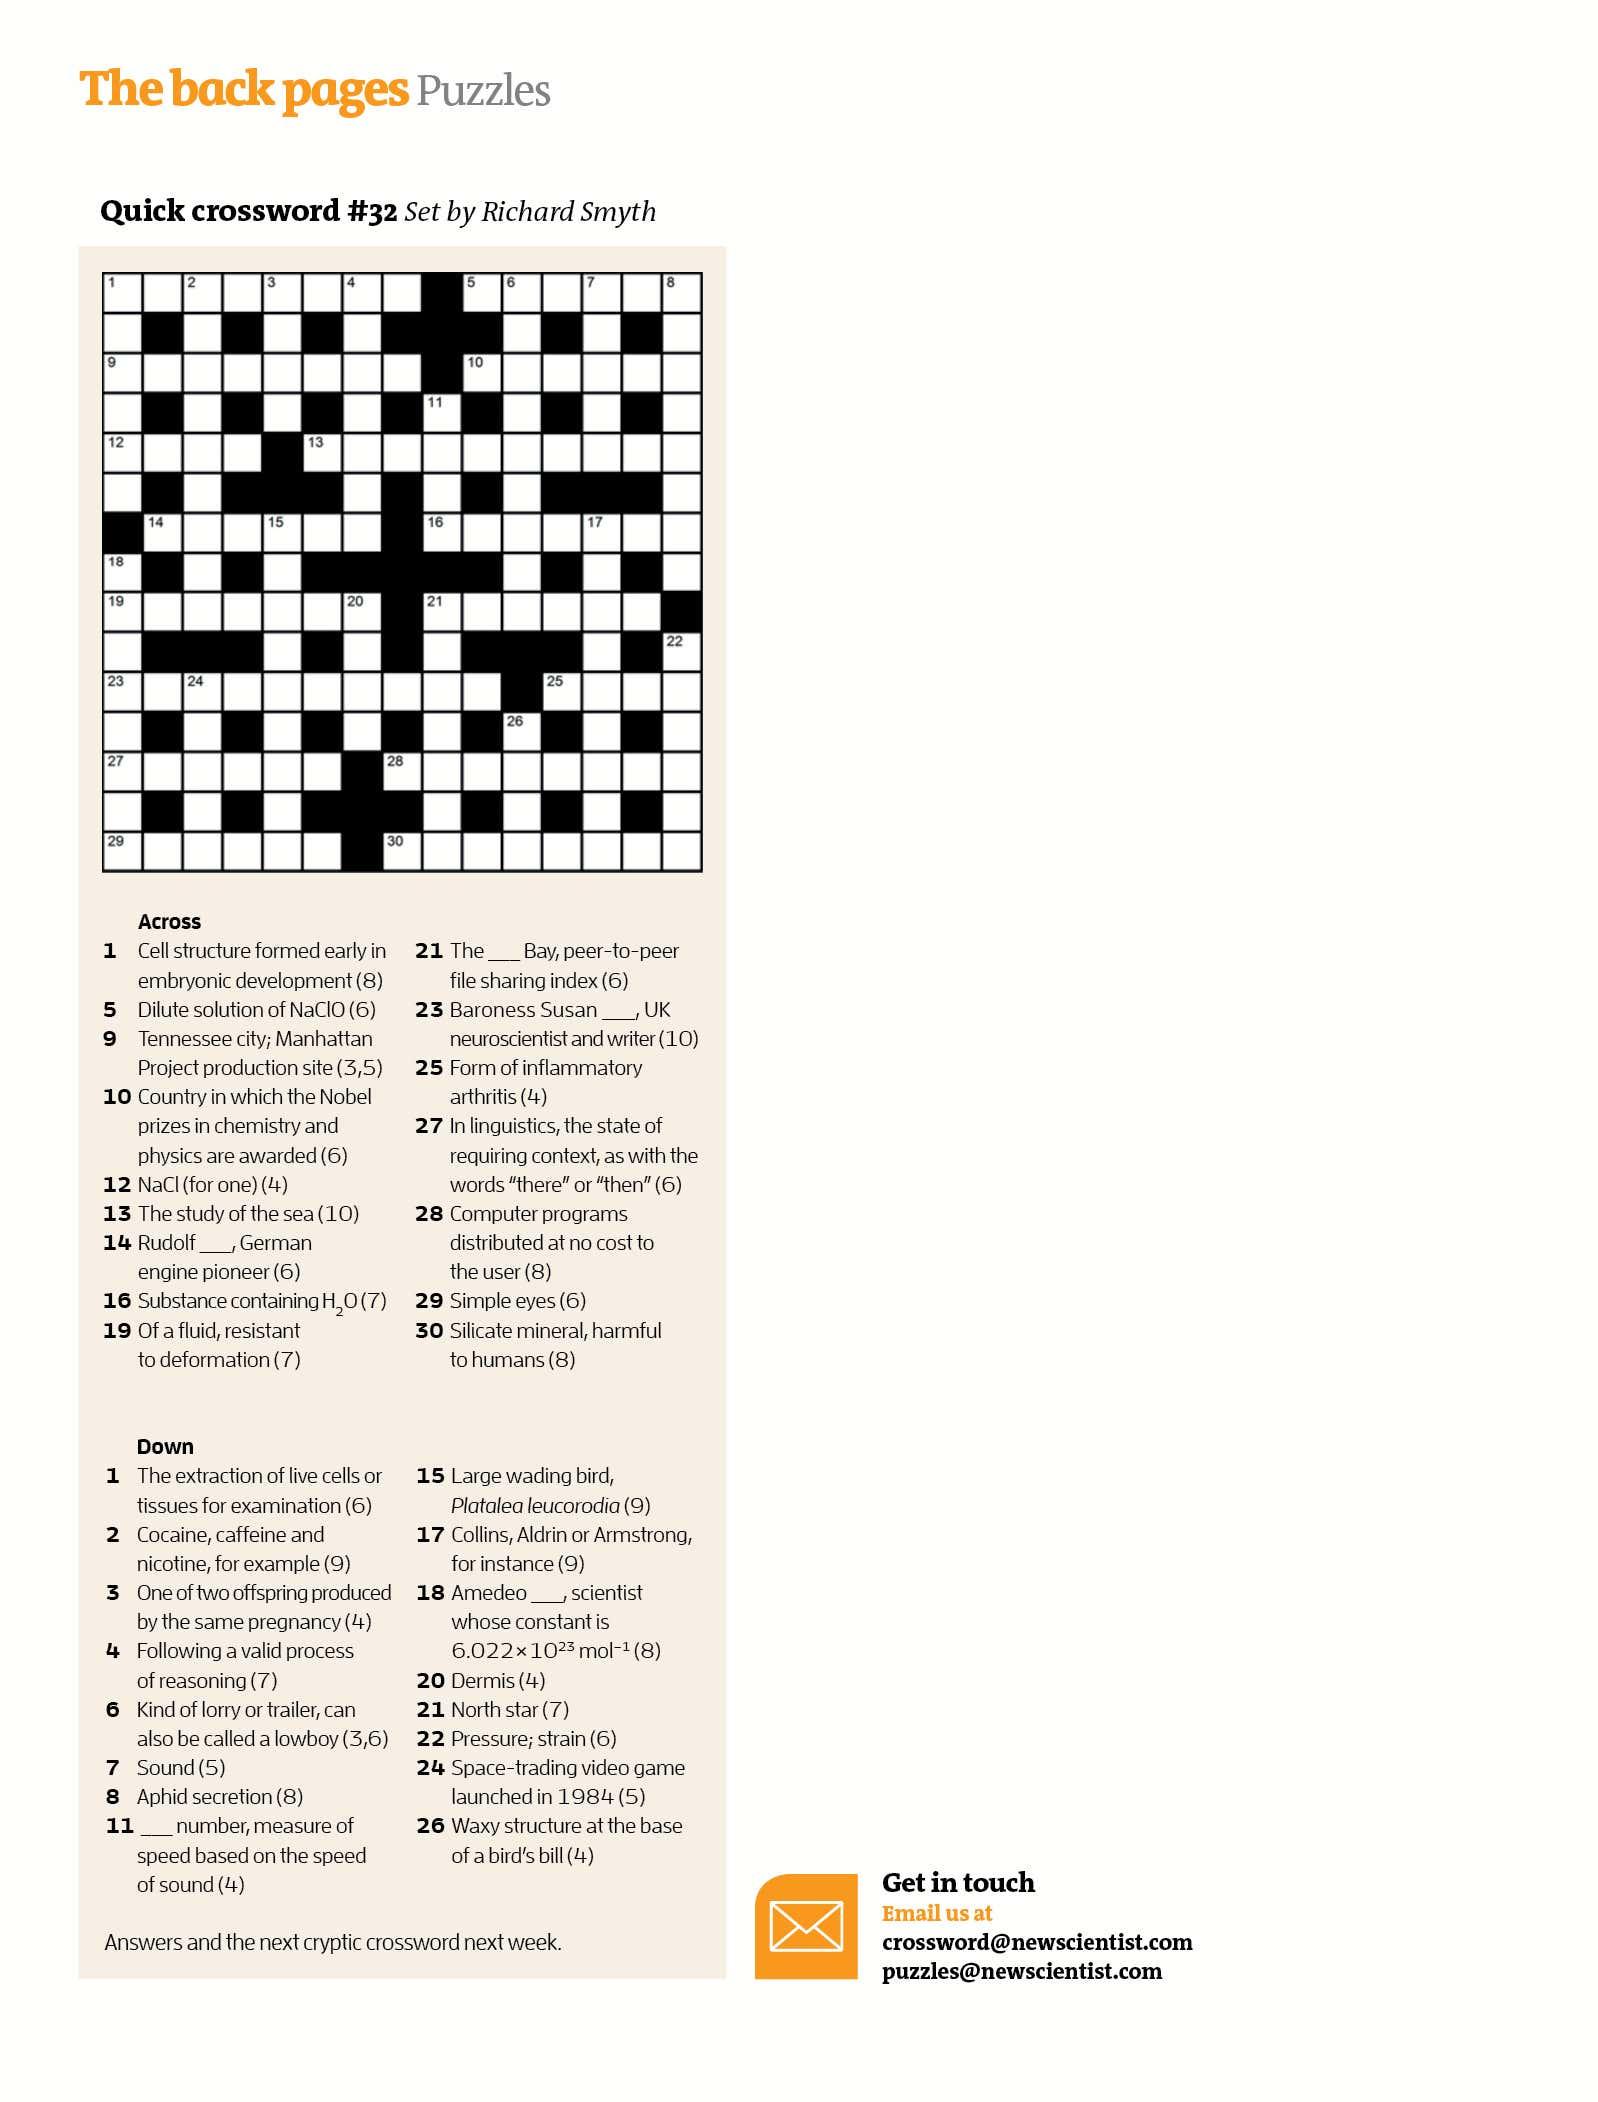 Quick Crossword #32 | New Scientist - Printable Quick Crossword